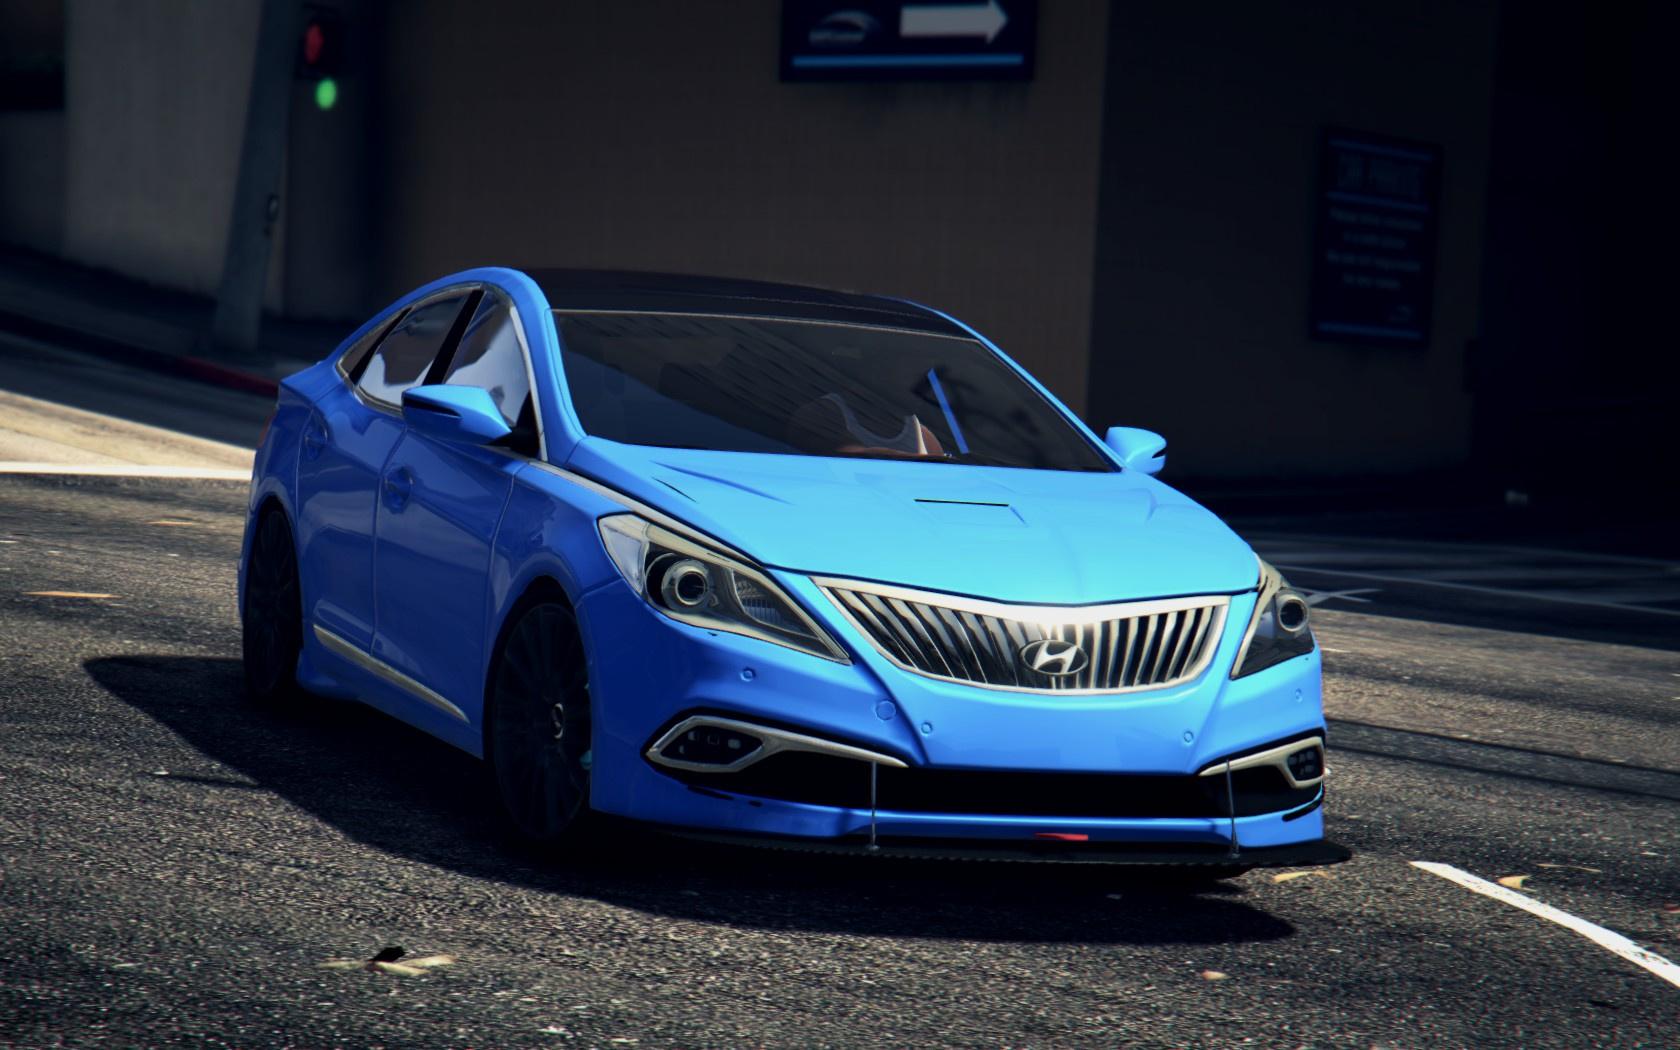 Tuning Parts For Hyundai Grandeur Azera Gta5 Mods Com